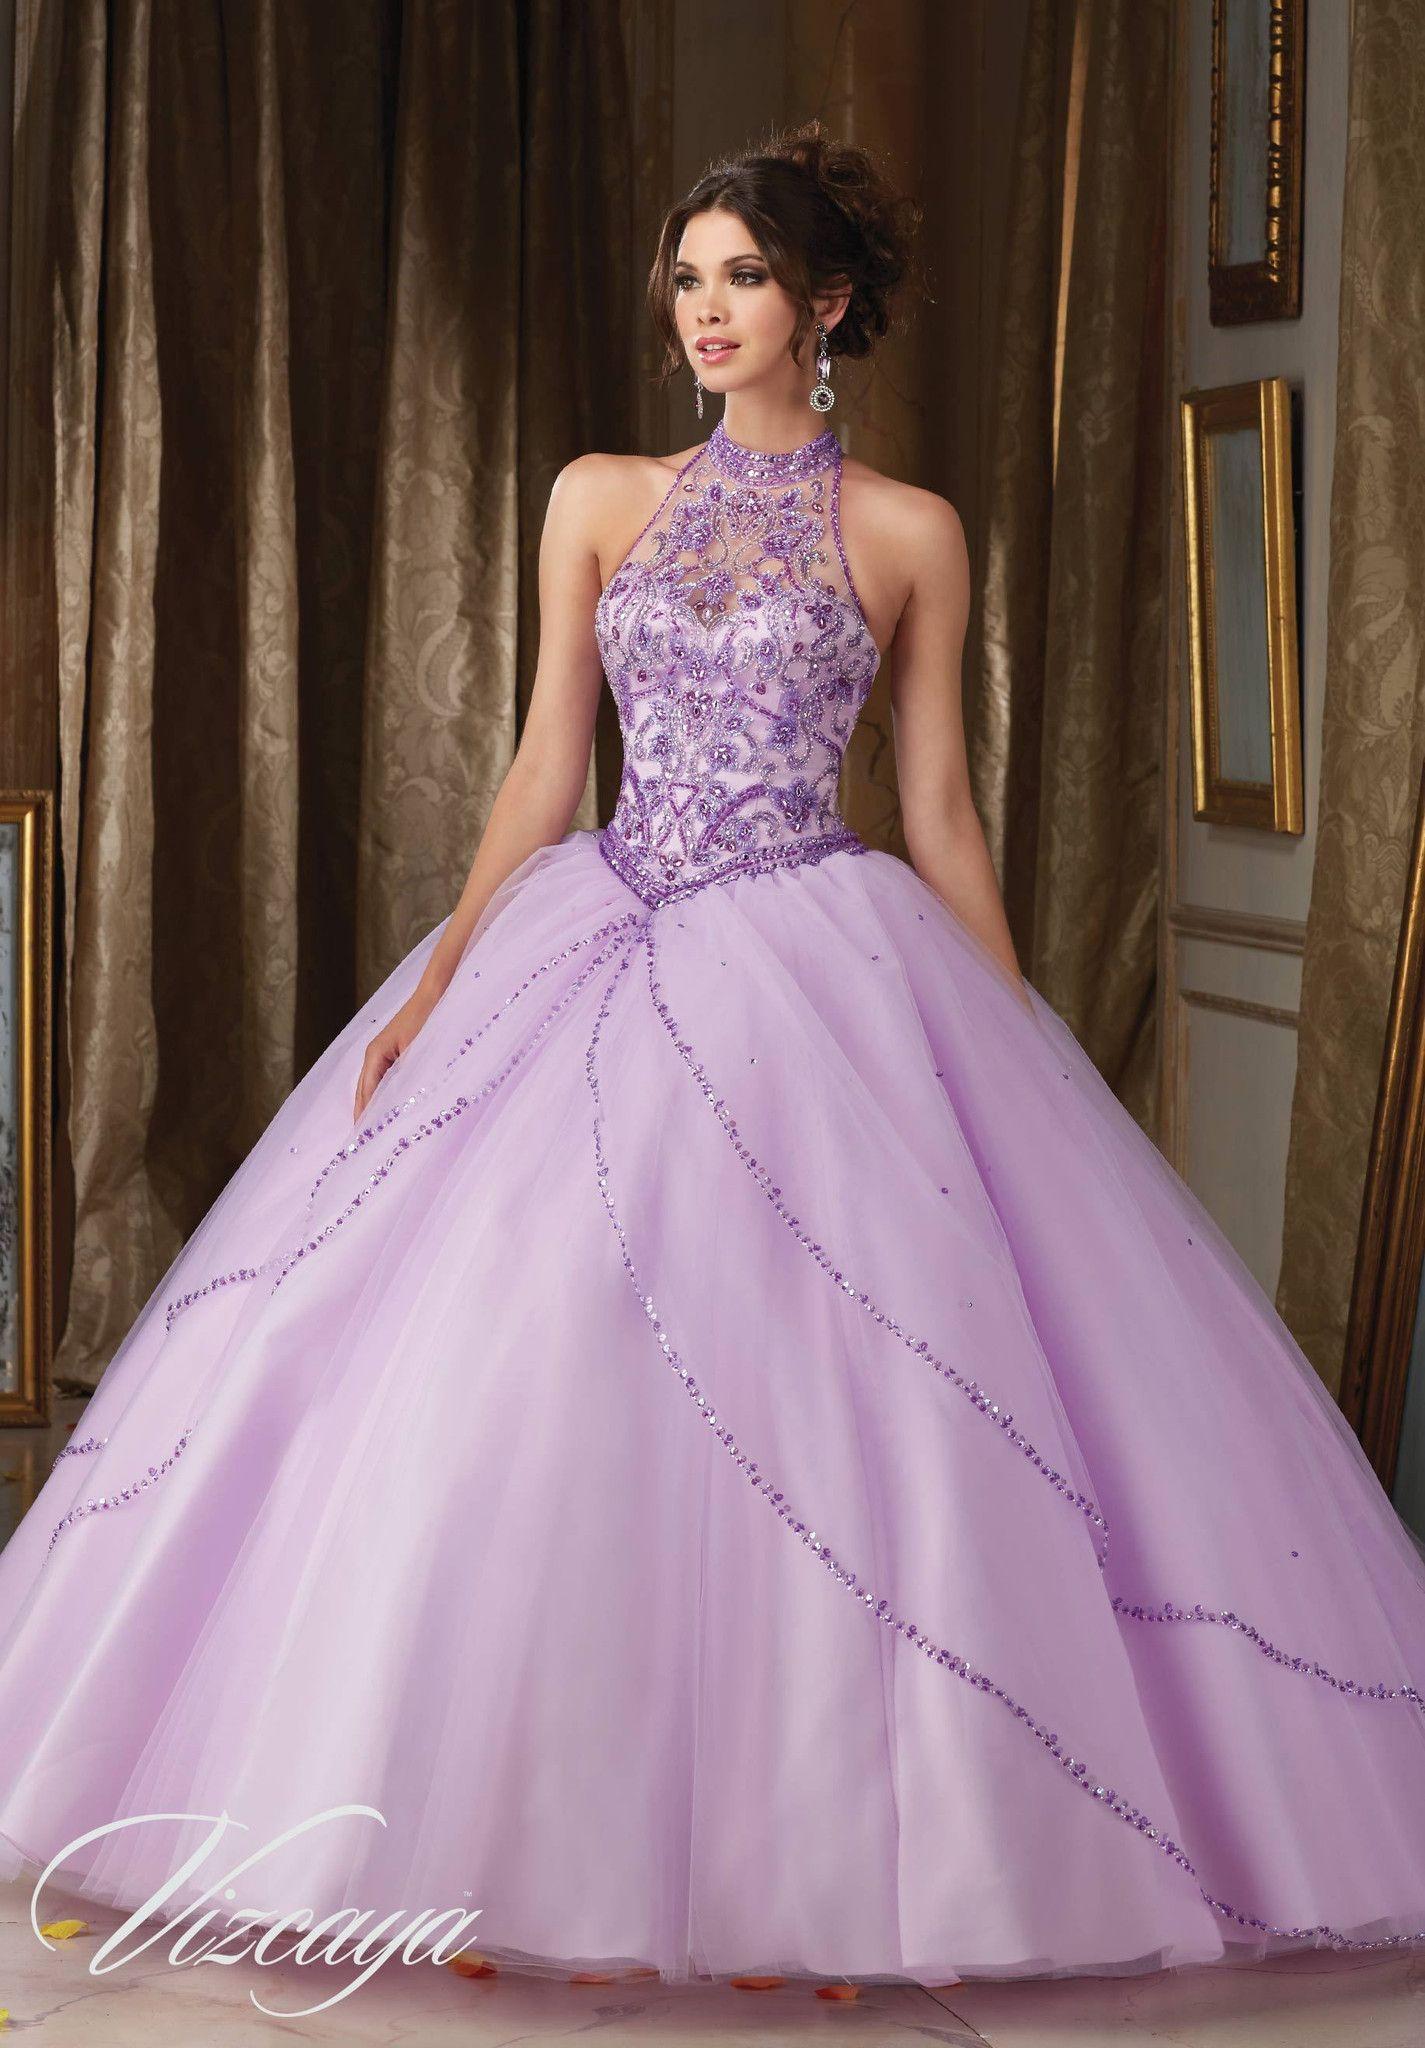 Jeweled Halter Quinceanera Dress by Mori Lee Vizcaya 89114 ...